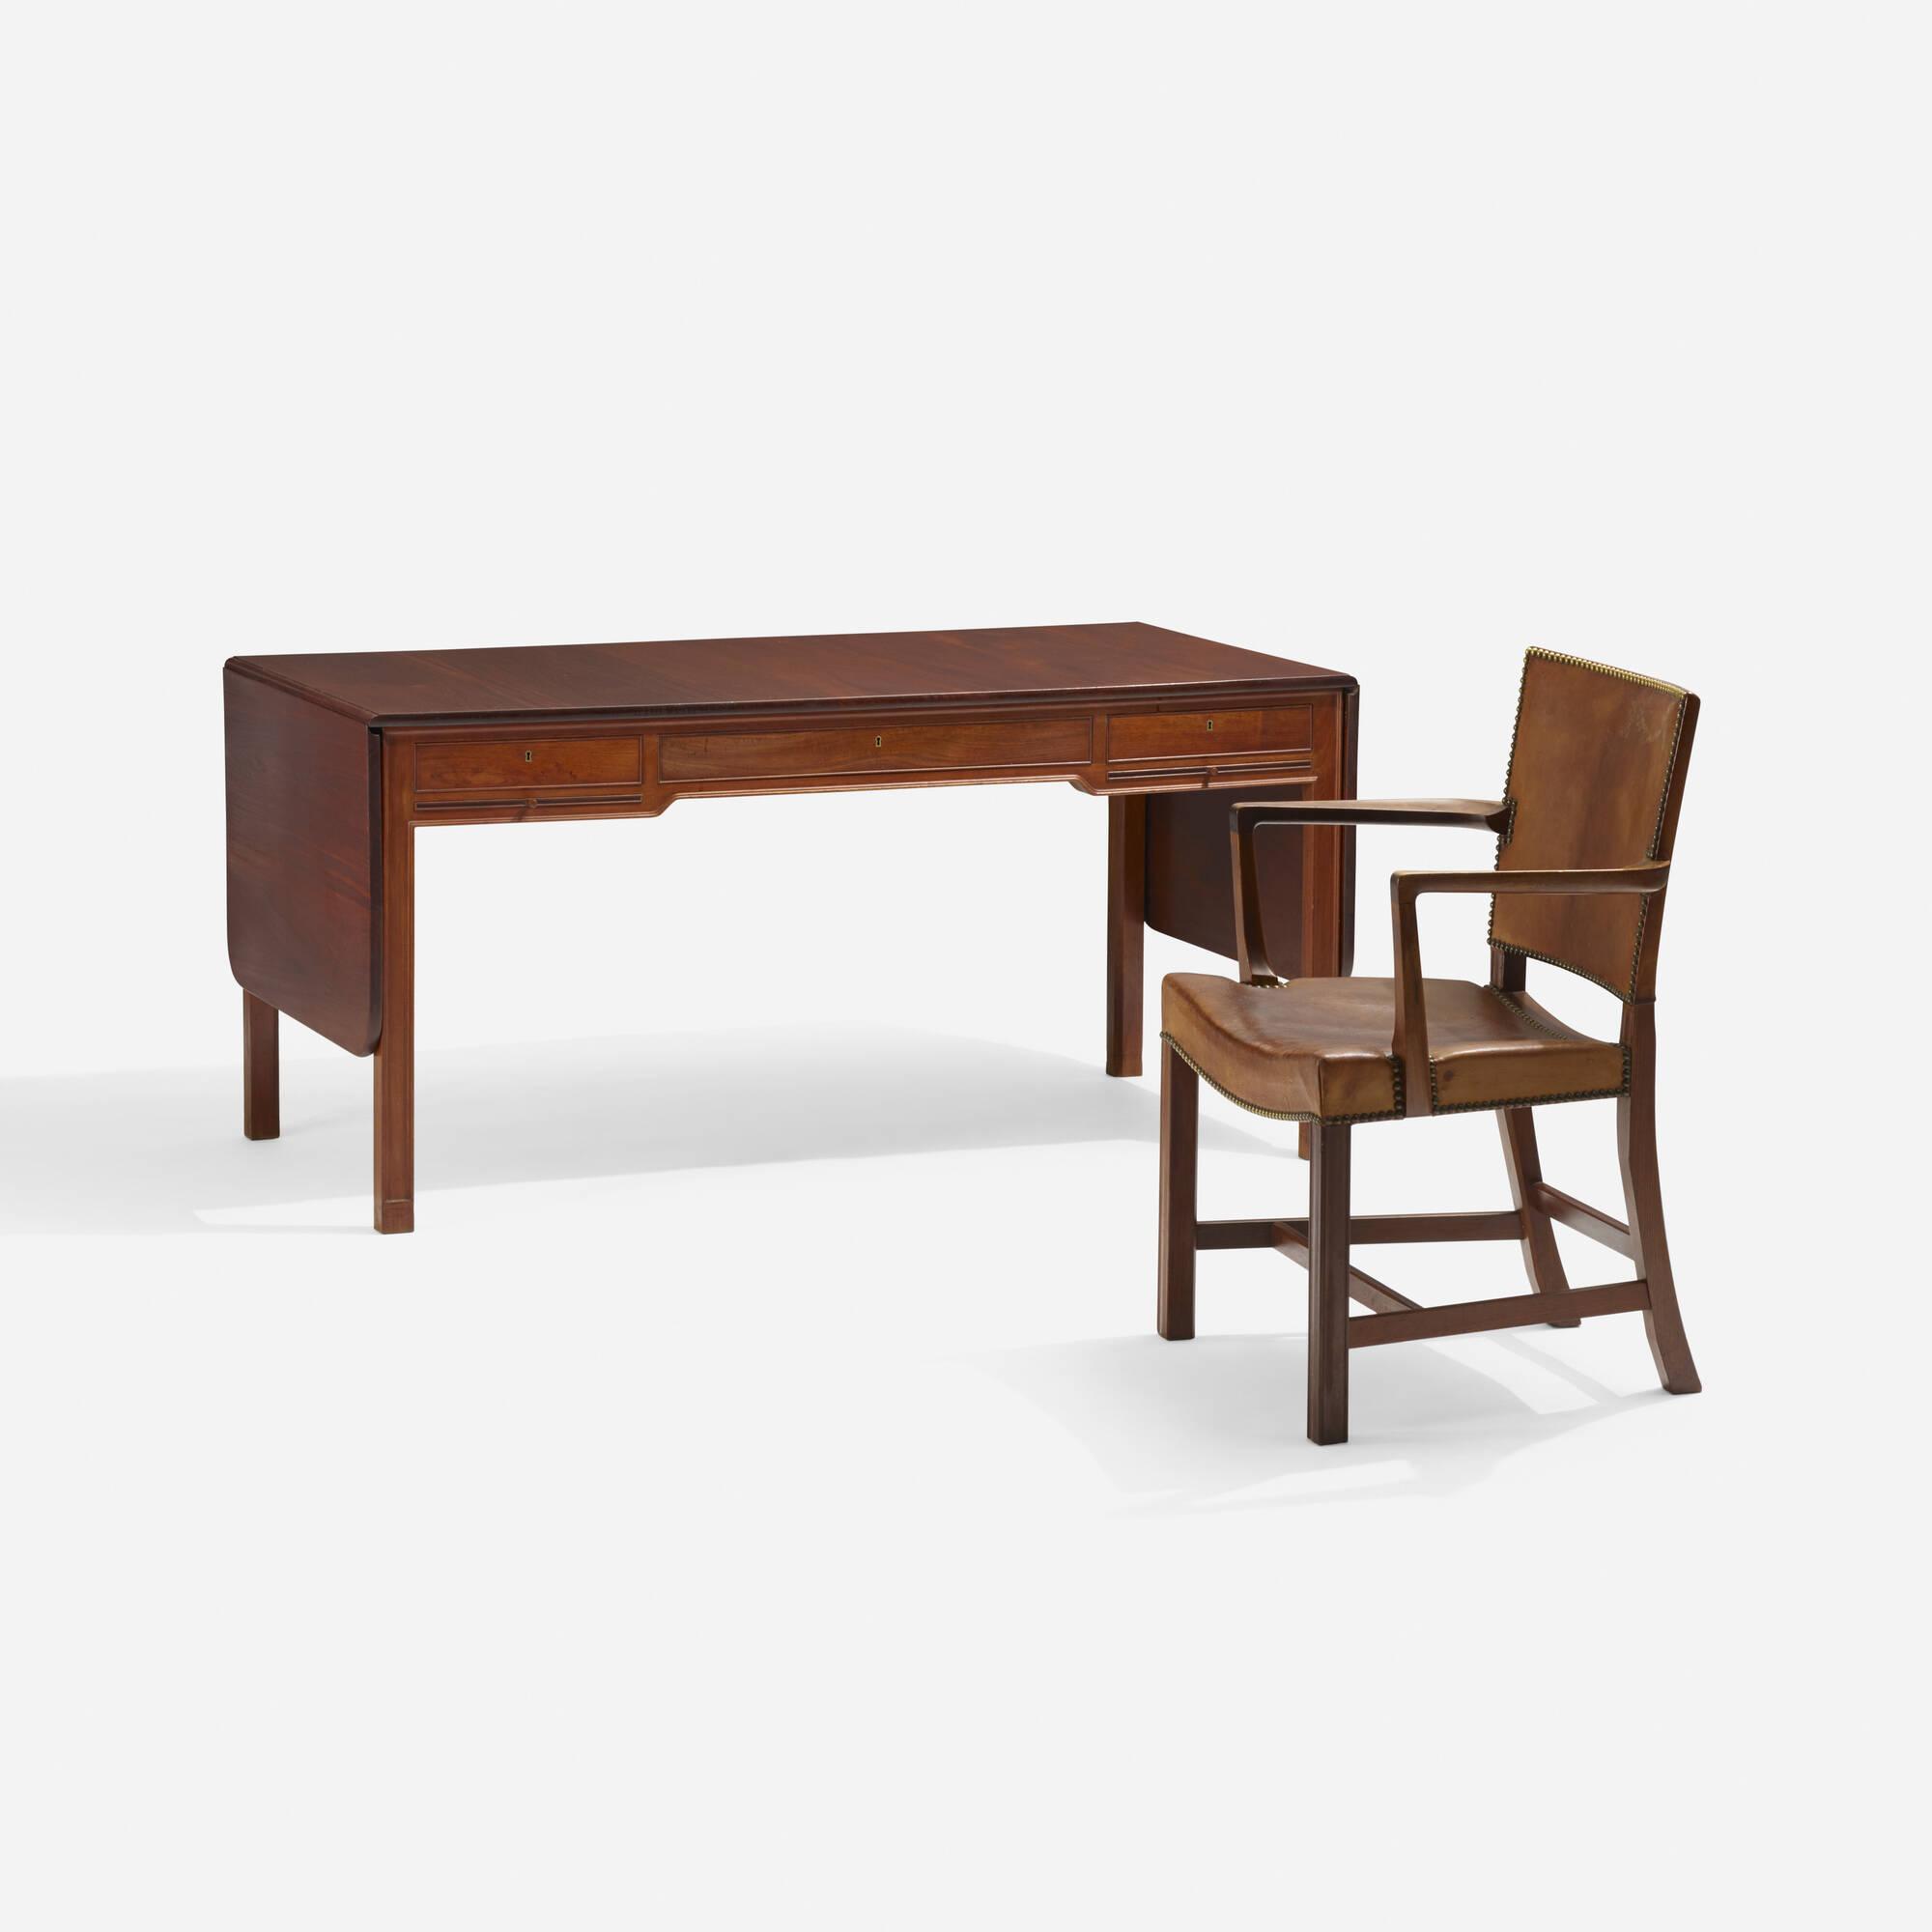 185: Kaare Klint / Red armchair and desk, model 4155 (1 of 2)